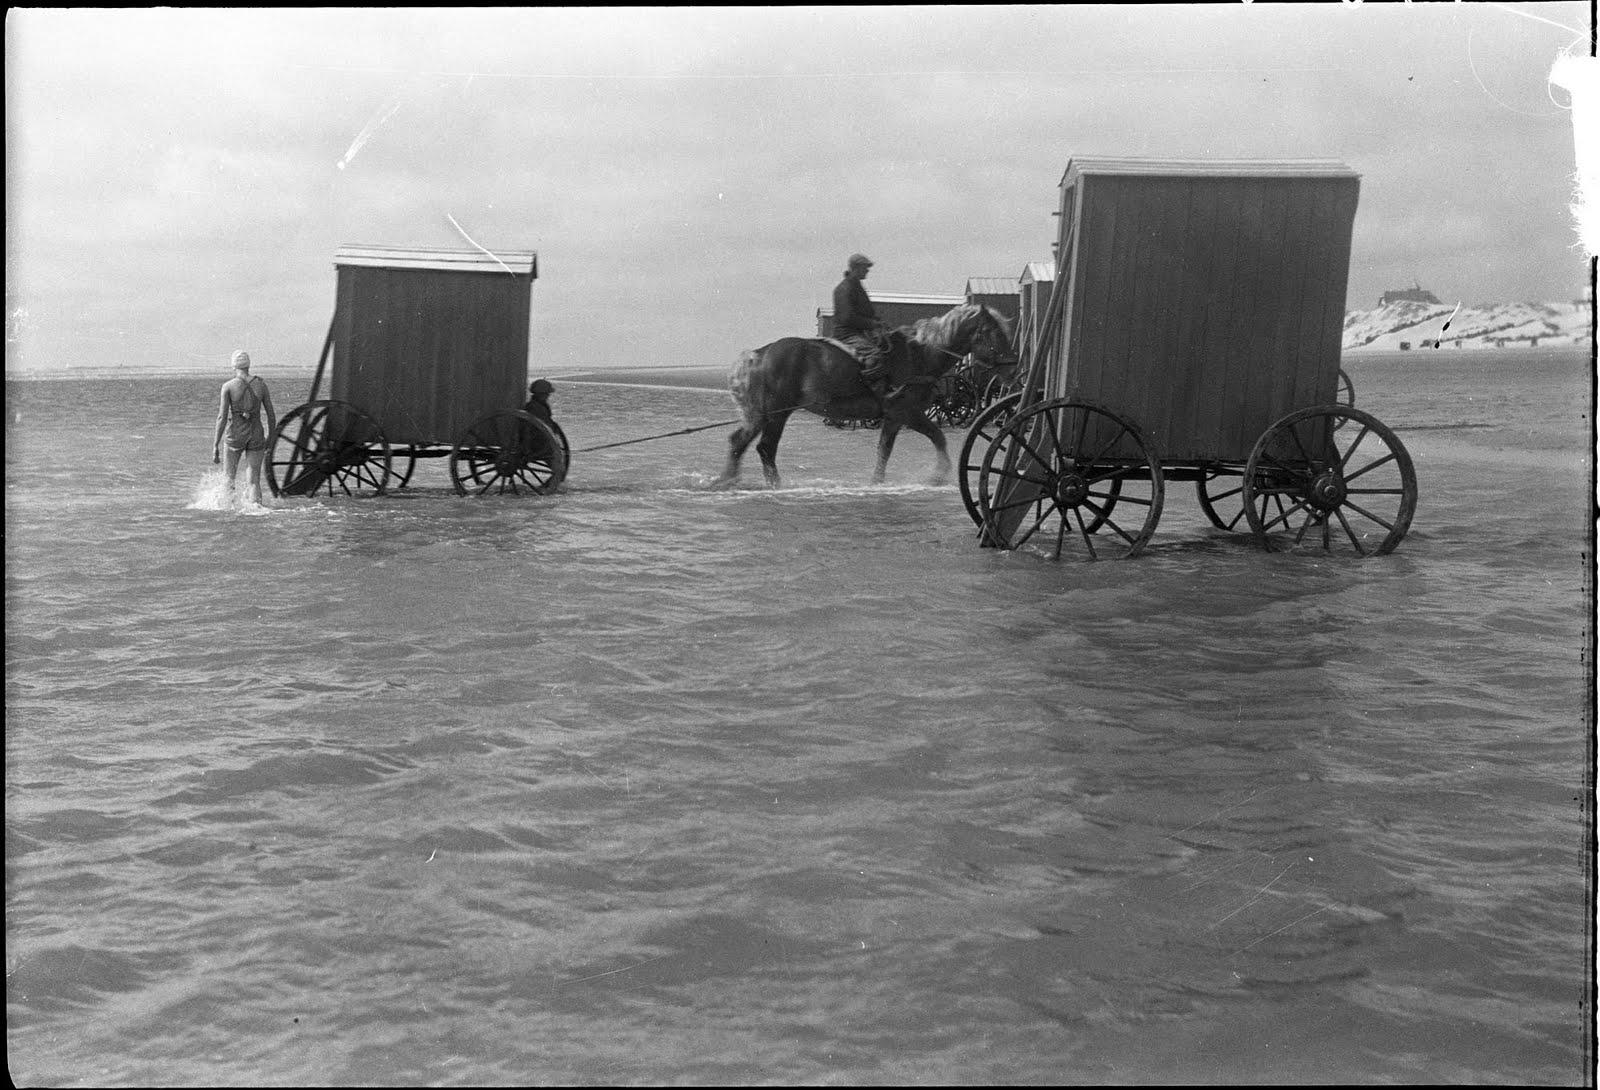 machine-bain-cabine-plage-mer-11.jpg